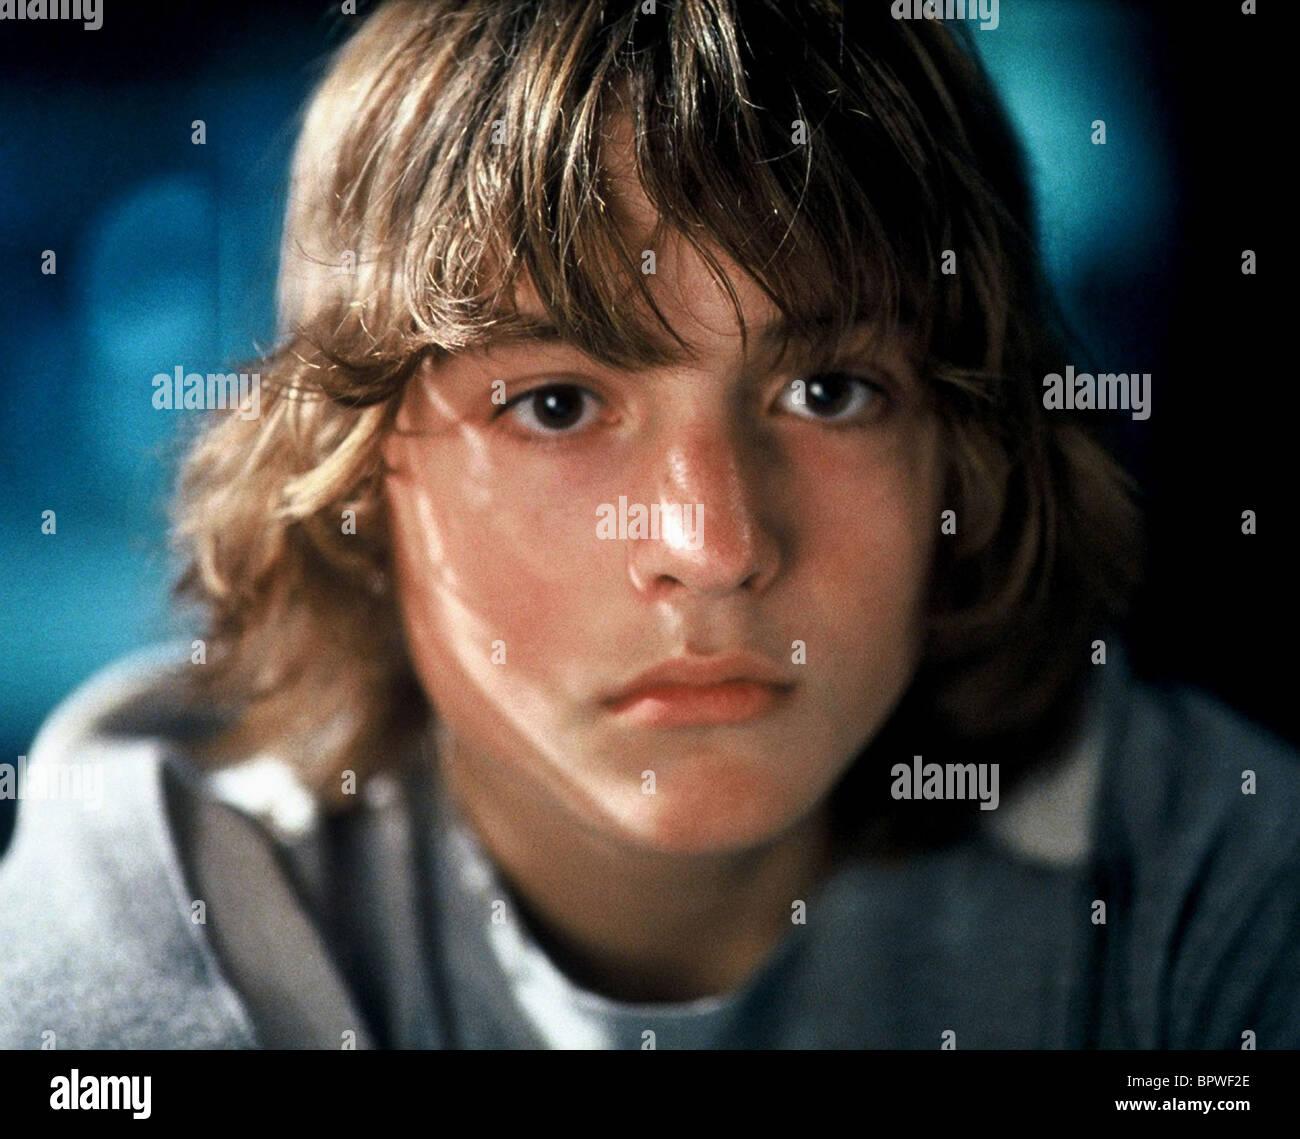 GABE NEVINS PARANOID PARK (2007) - Stock Image